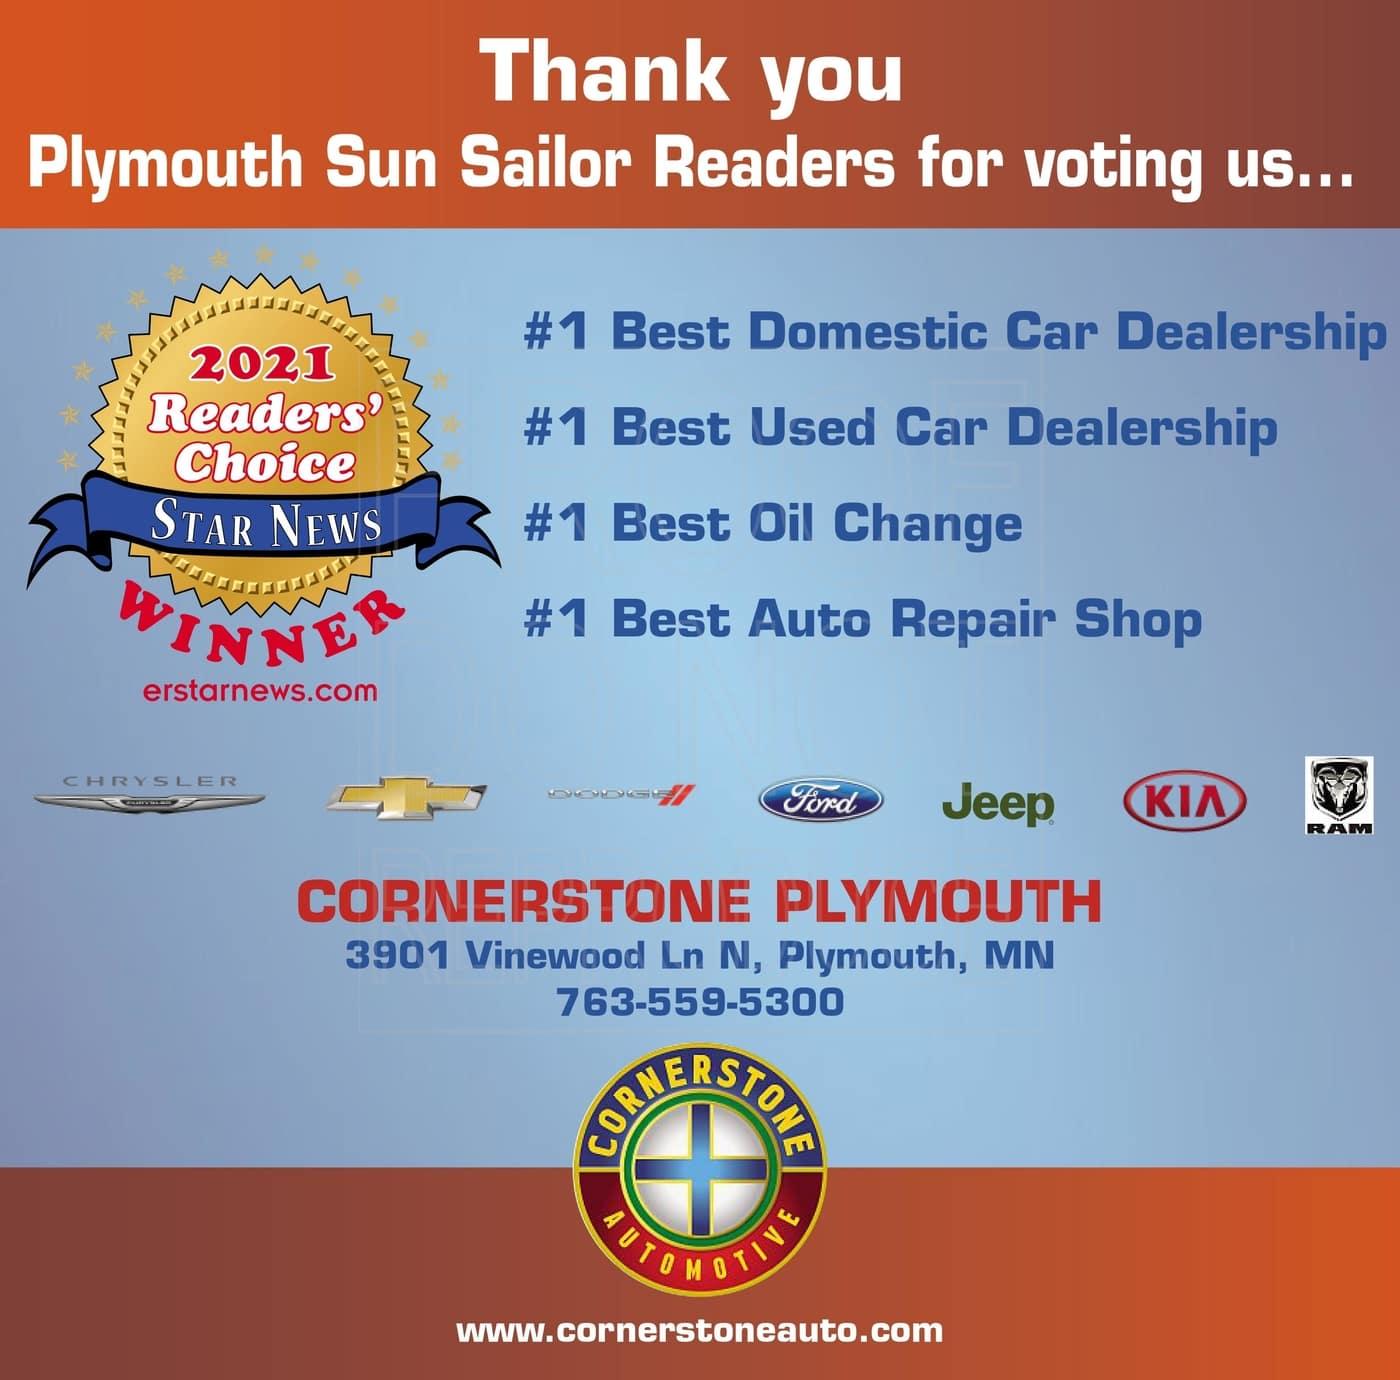 2021 Cornerstone Plymouth Readers' Choice Award